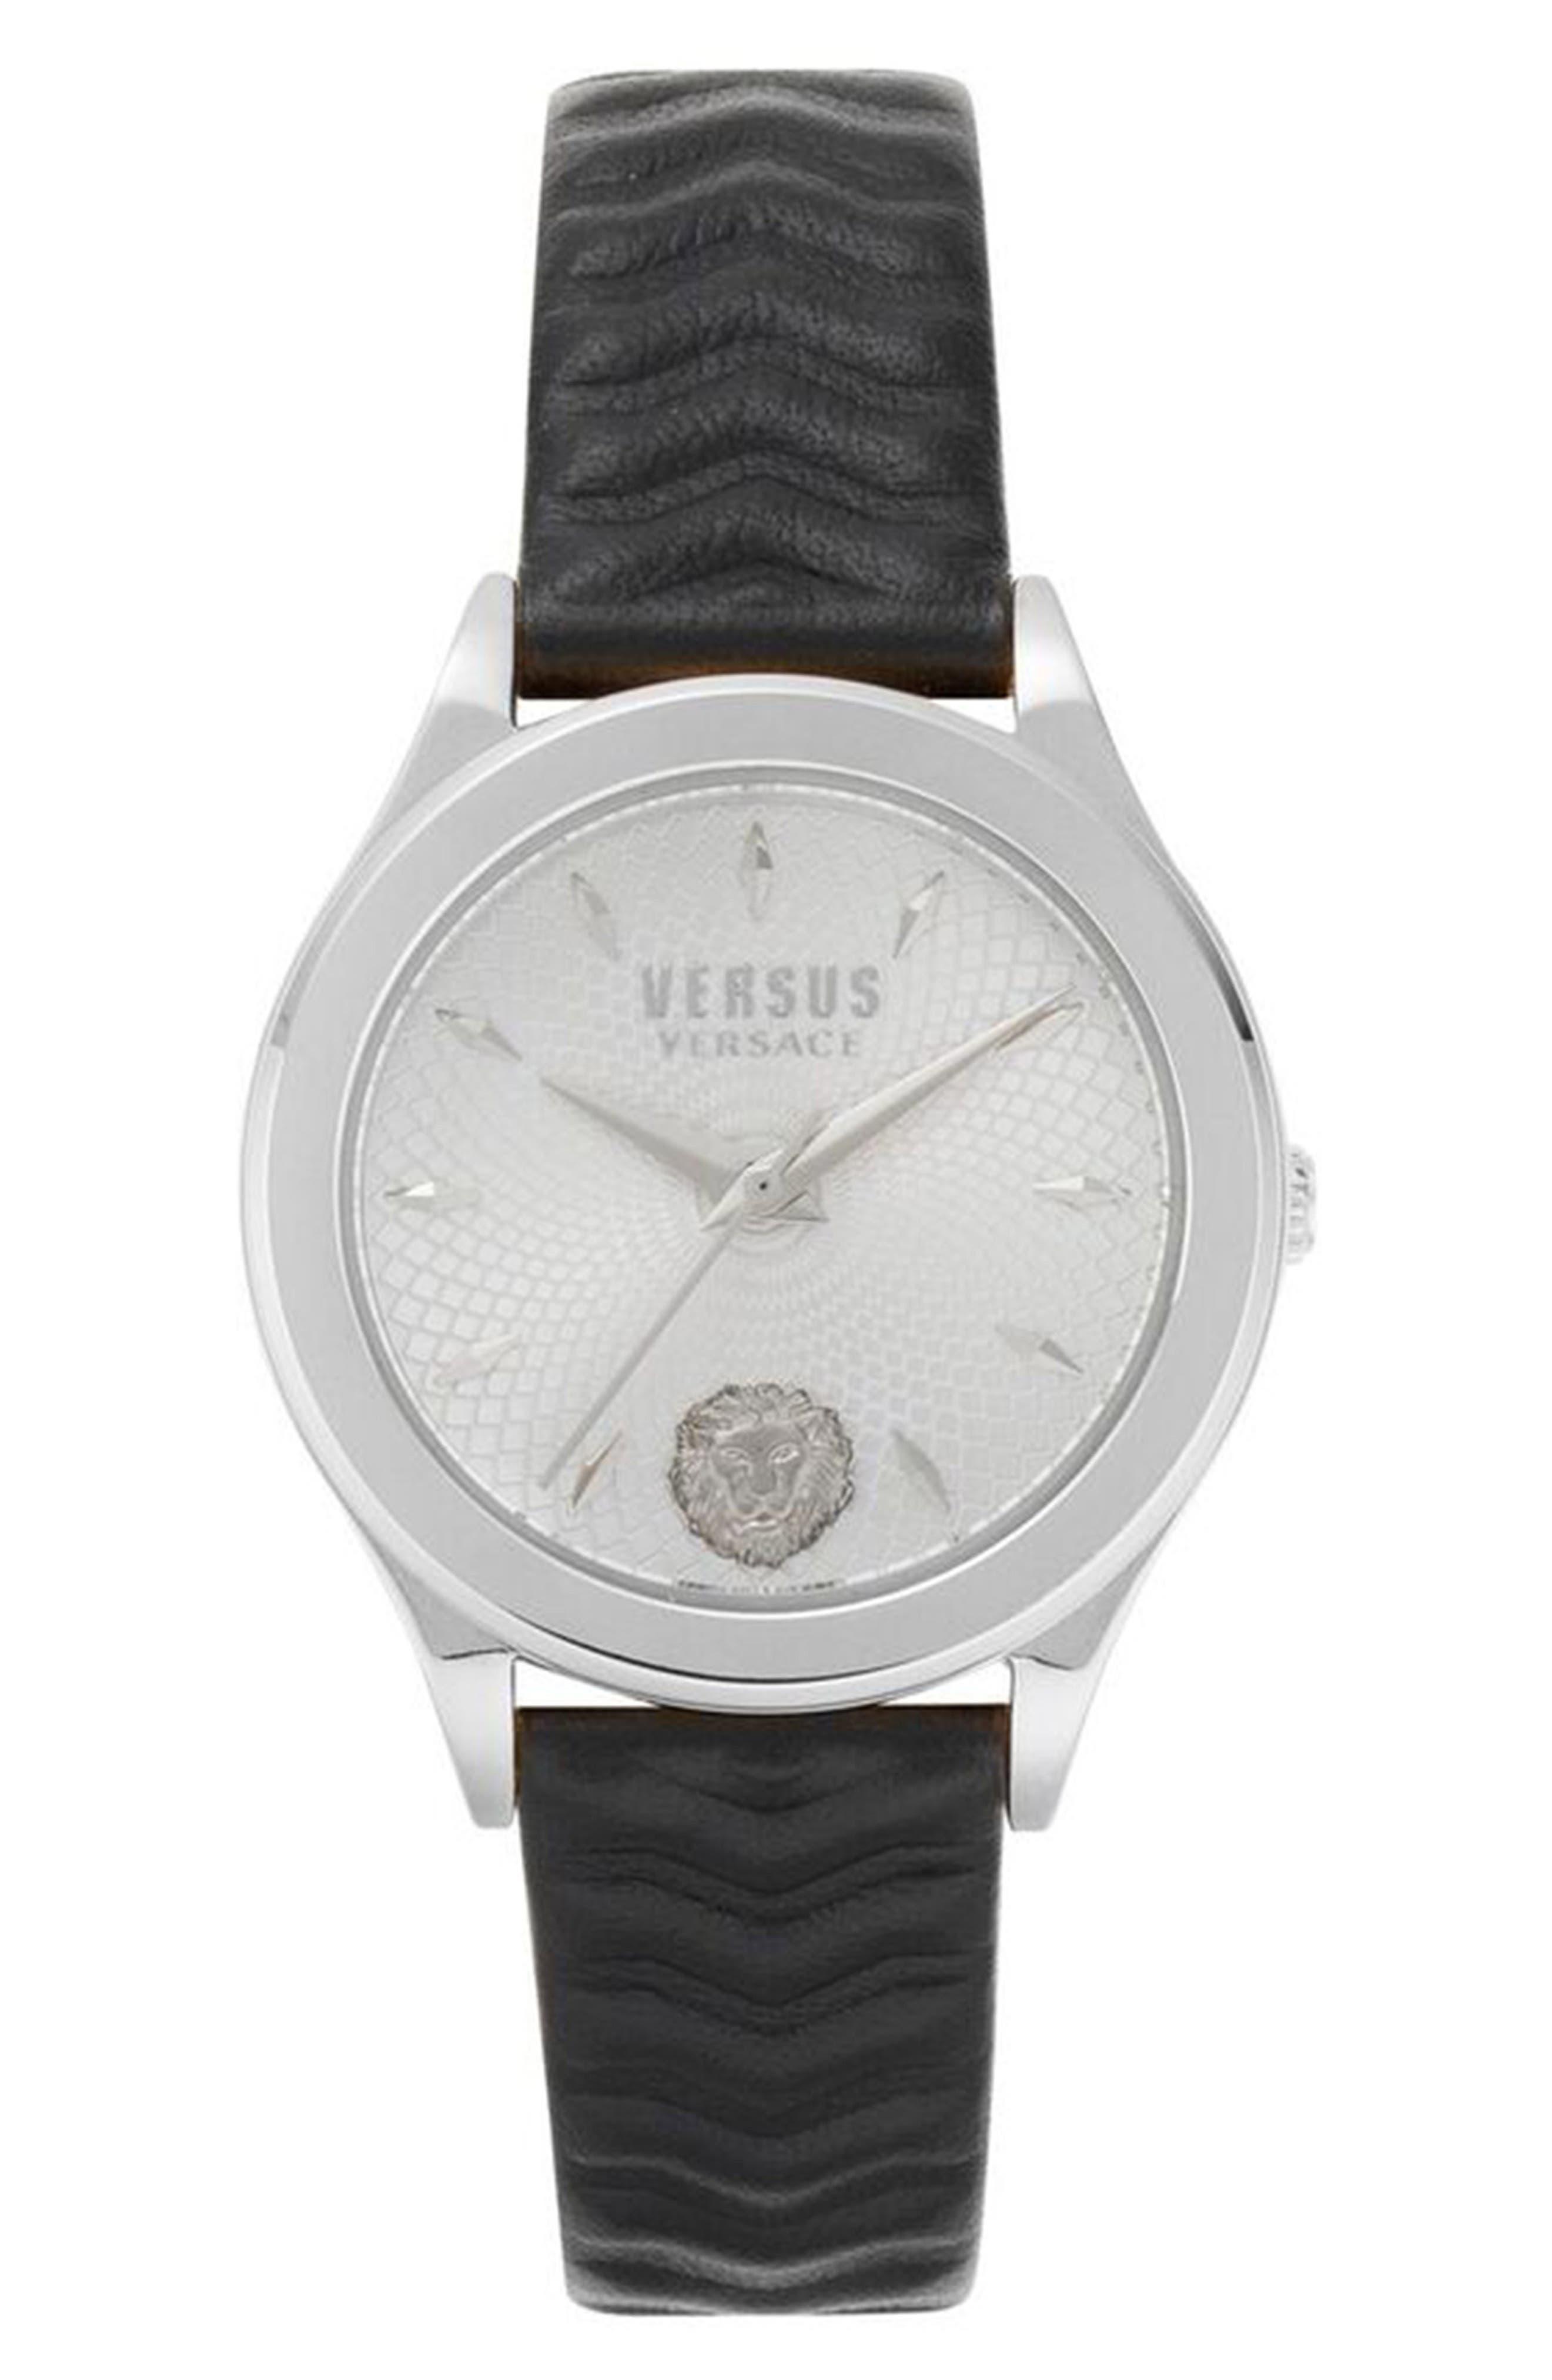 VERSUS VERSACE, Mount Pleasant Leather Strap Watch, 34mm, Main thumbnail 1, color, BLACK/ SILVER